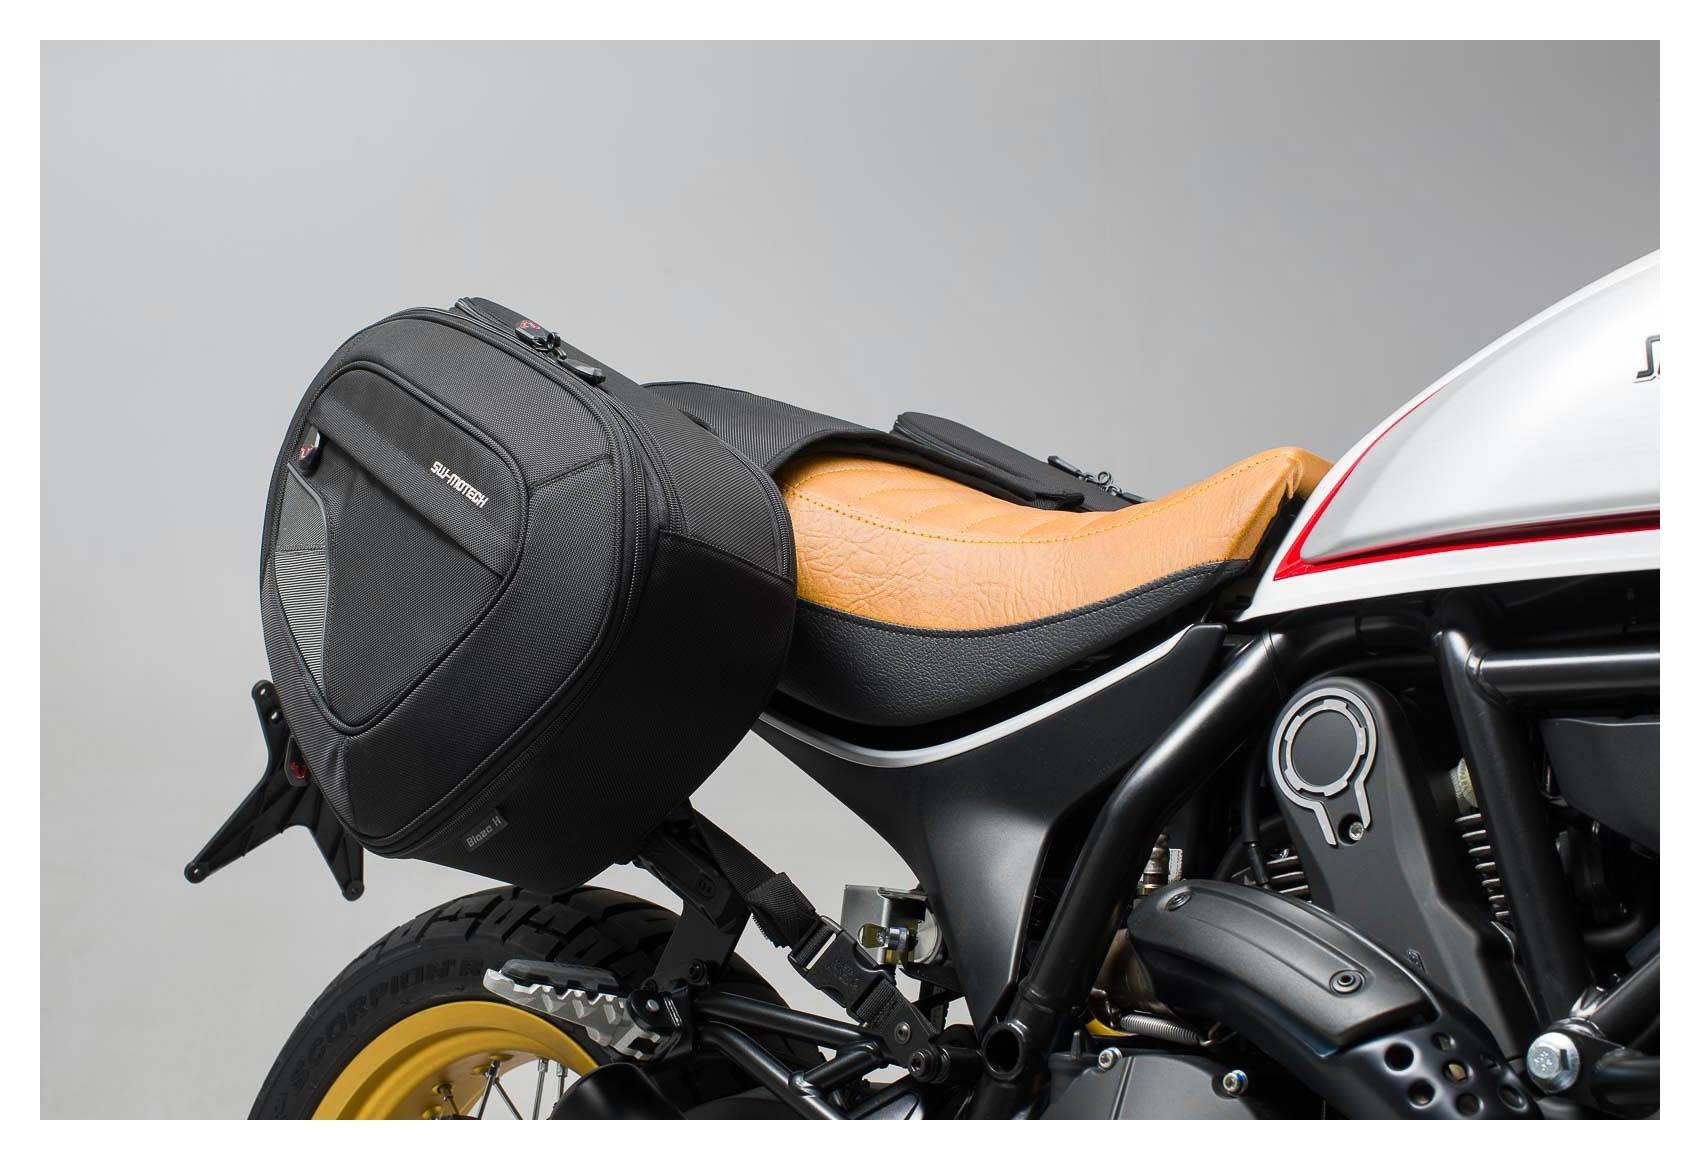 Sw Motech Blaze Saddlebag System Ducati Scrambler Desert Sled 2017 848 Evo Fuse Box 2018 15 6793 Off Revzilla